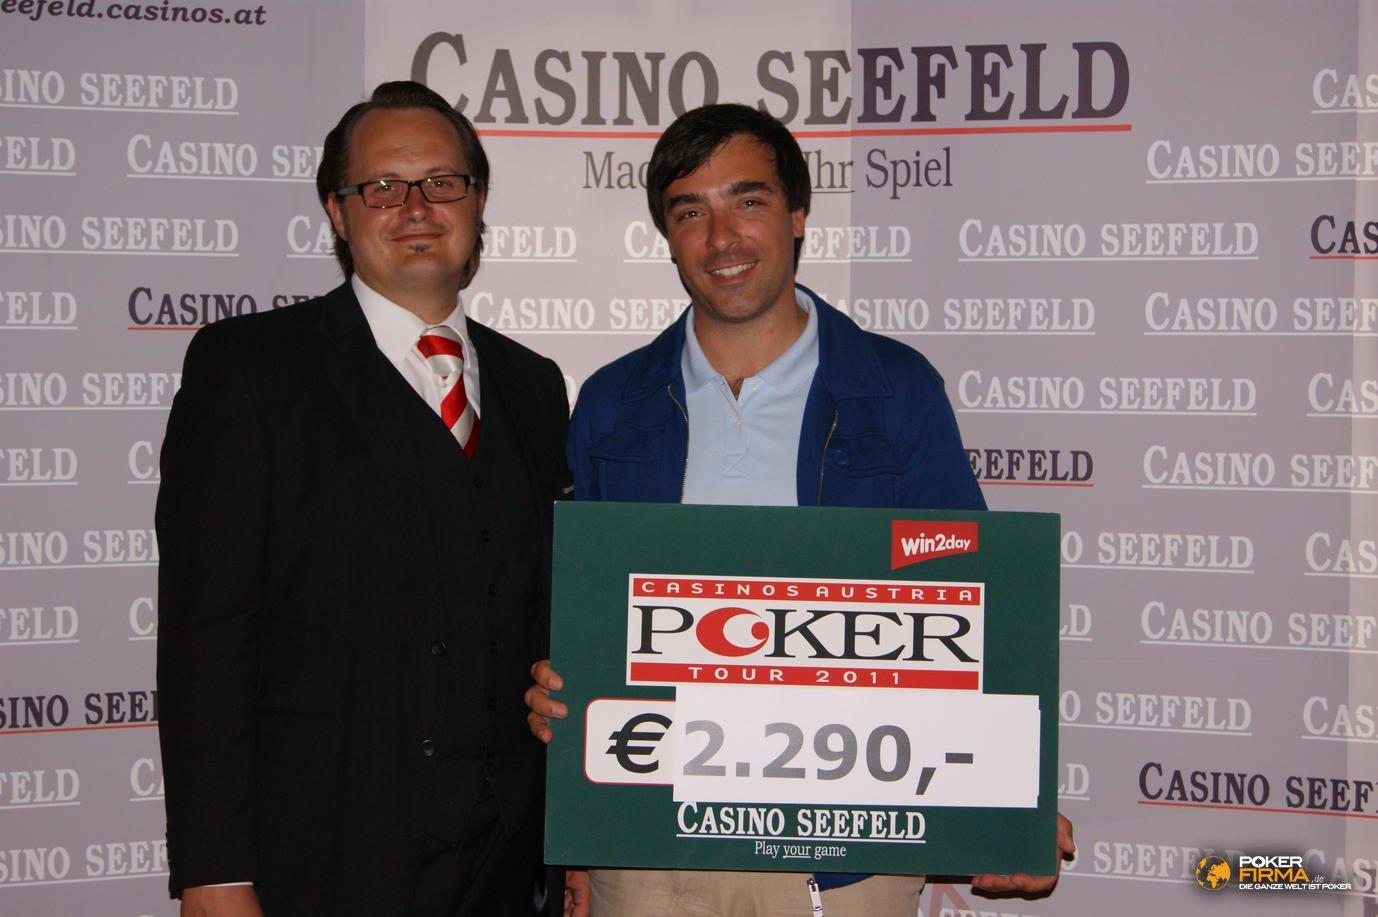 Mountain_Poker_Party_250_NLH_FT_051011_Albin Vogl